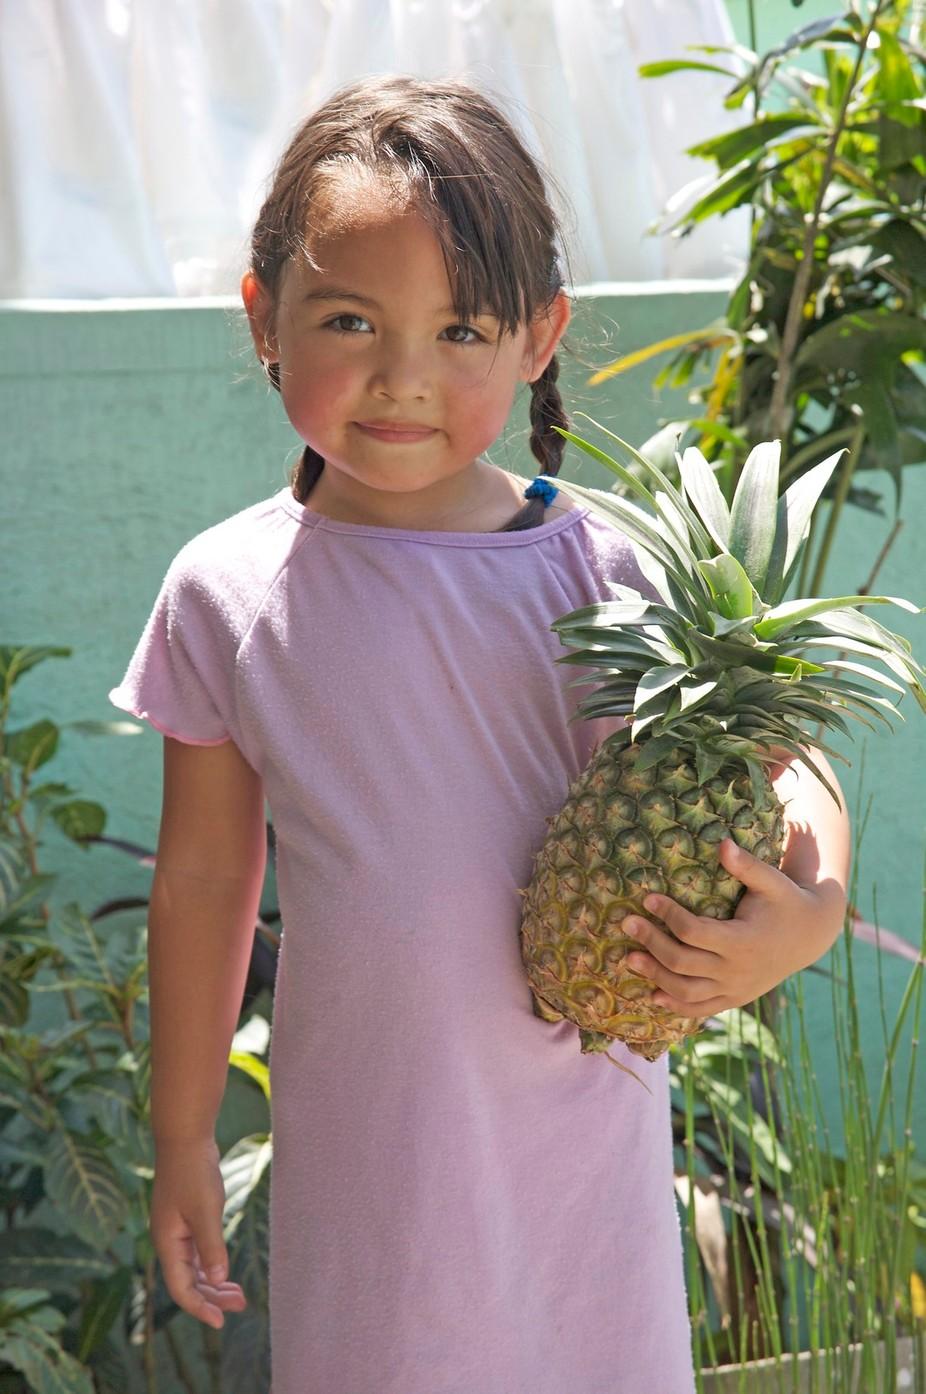 Pretty filipino girl. Holding a pineapple